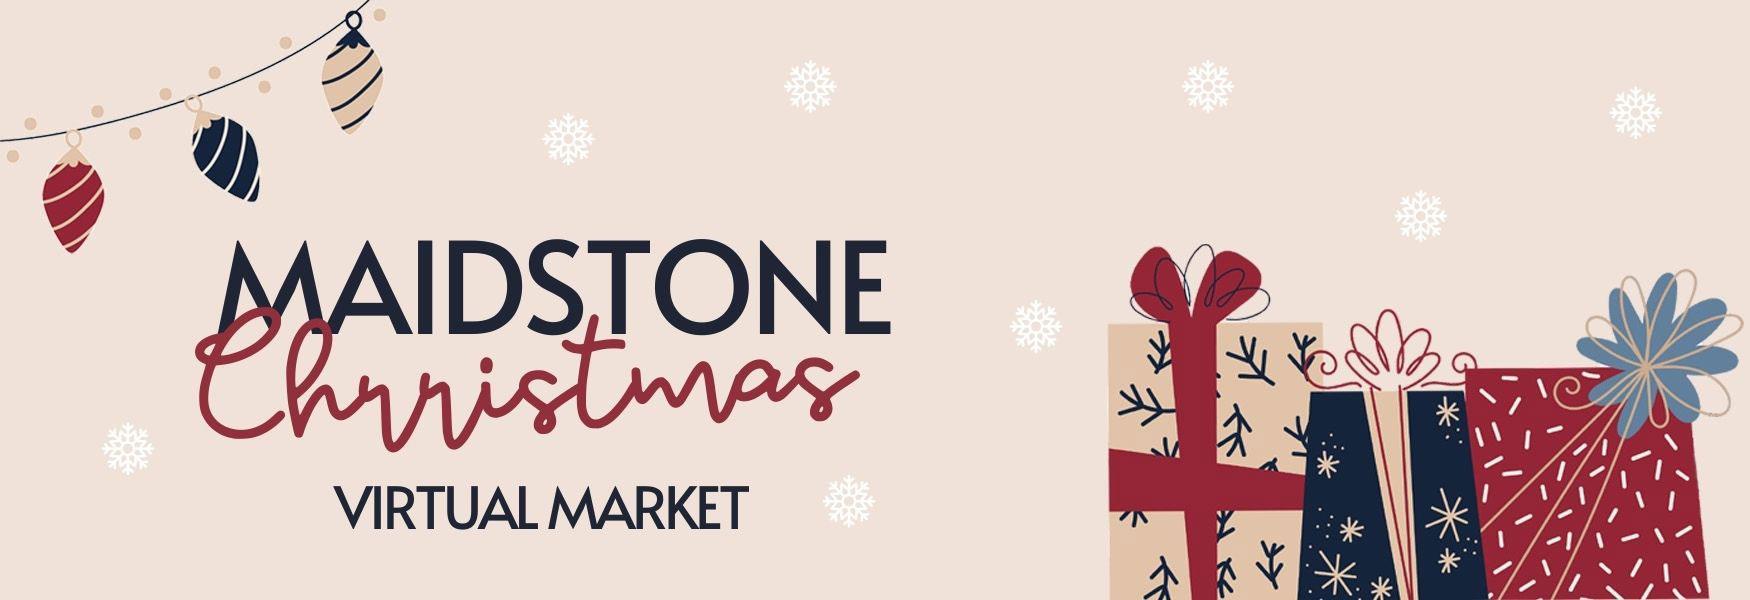 Maidstone Christmas Market